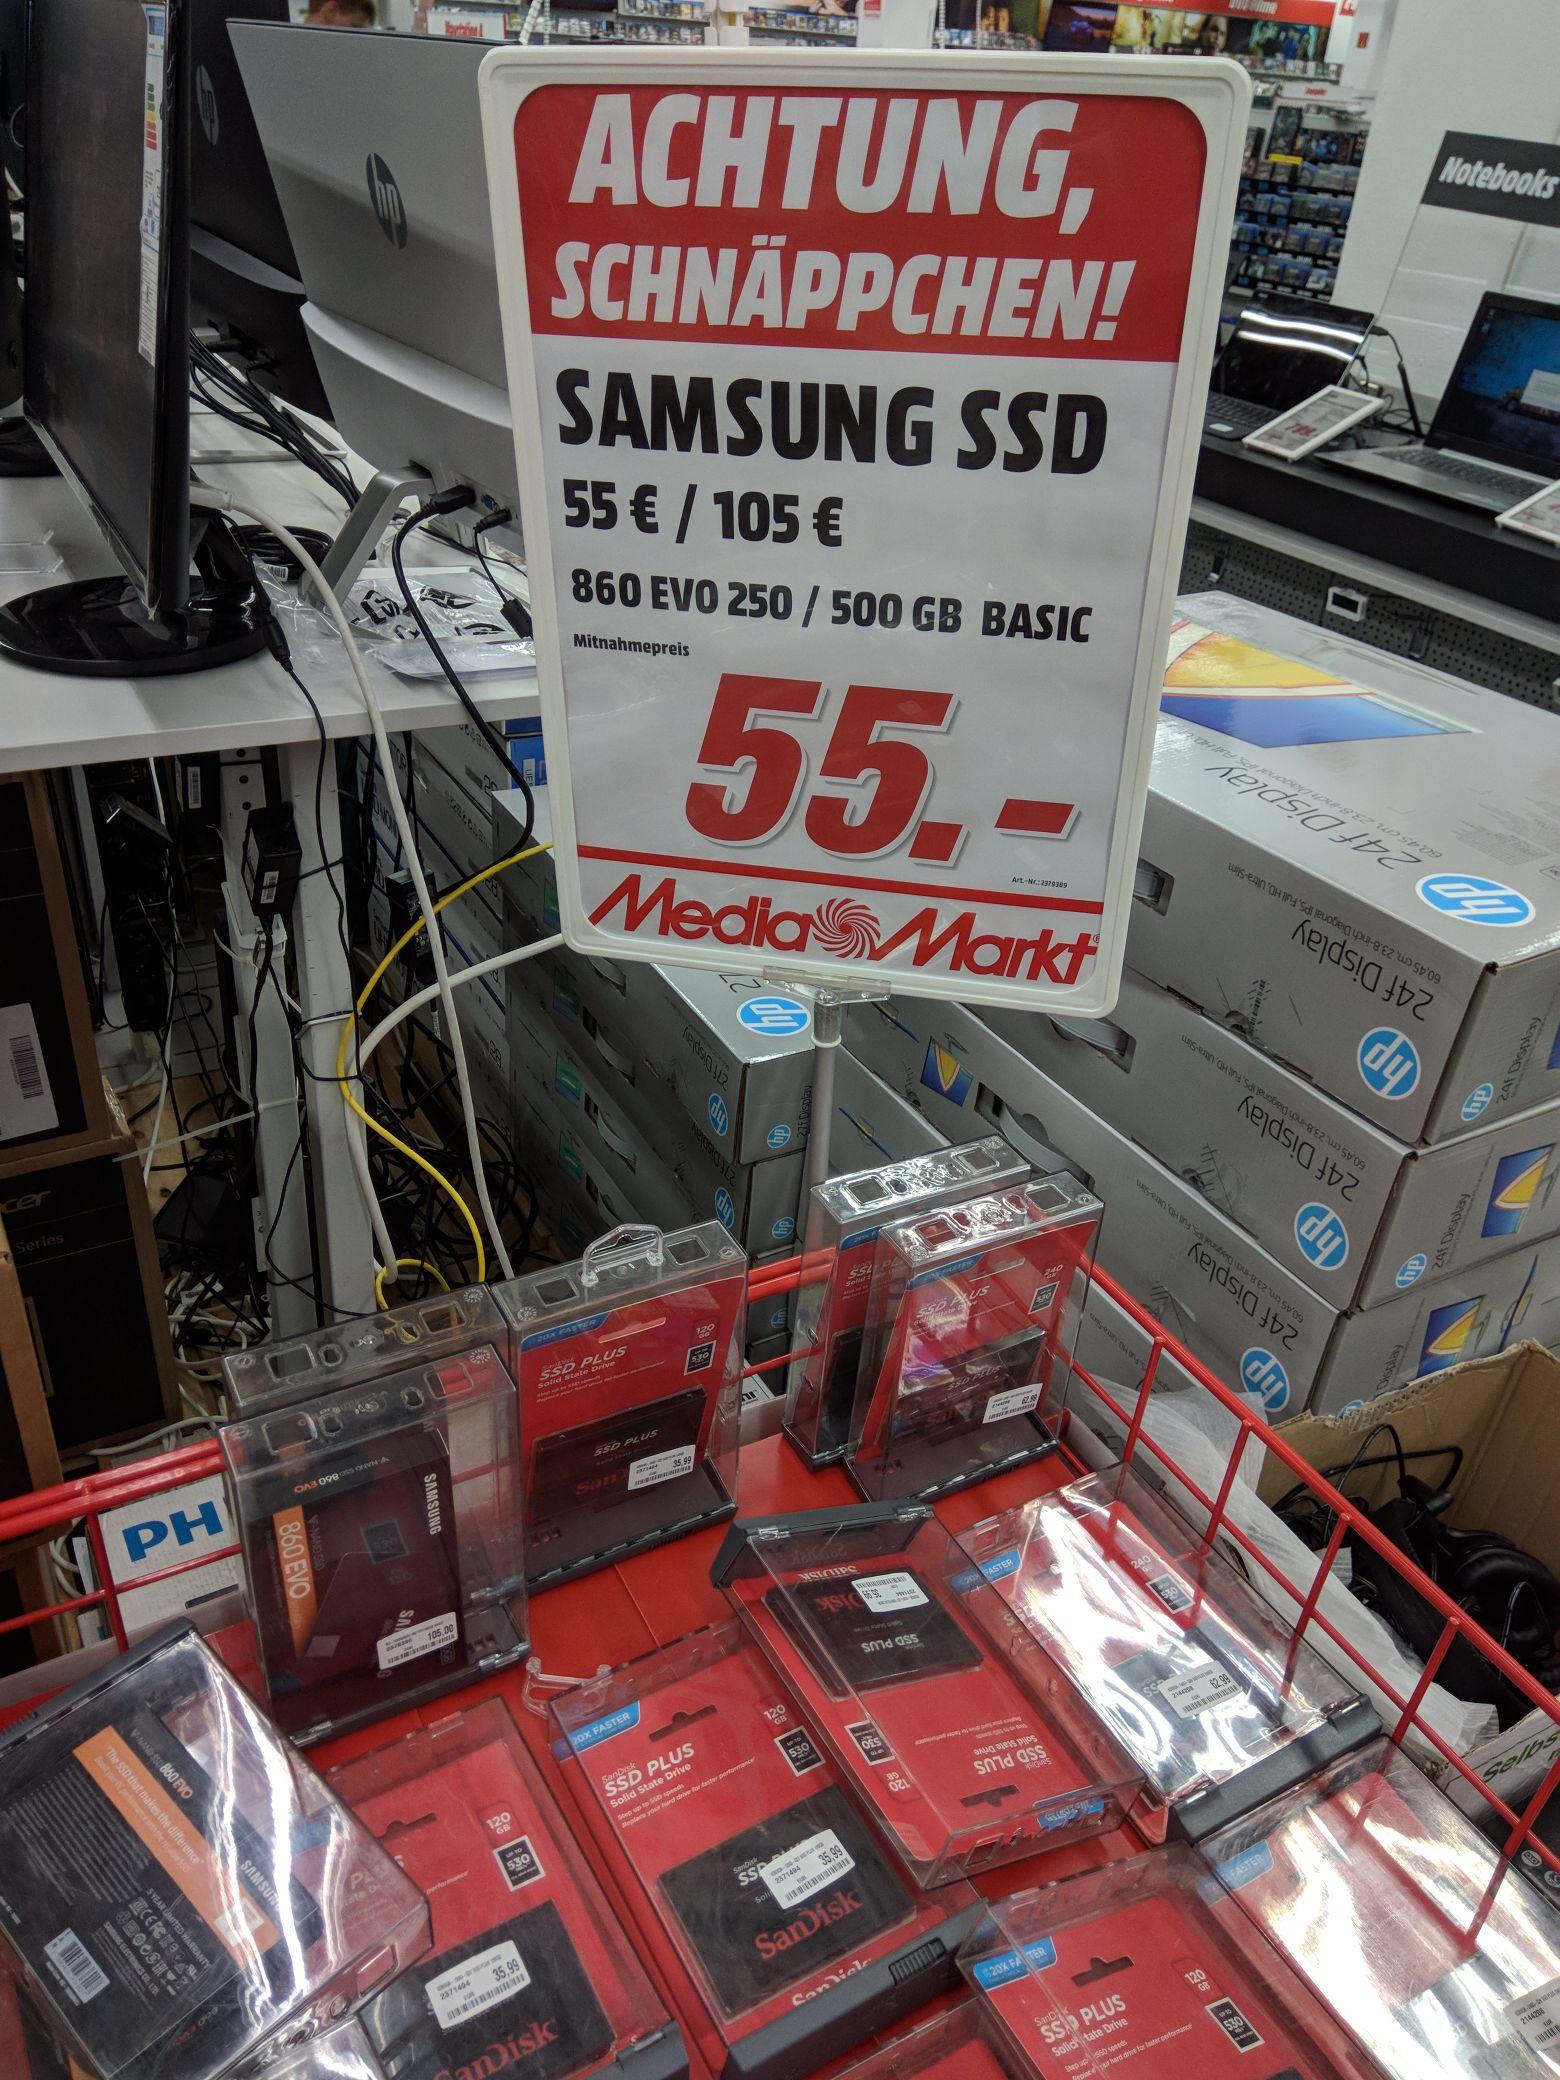 Samsung SSD 860 Evo 250GB (lokal Wiesbaden)